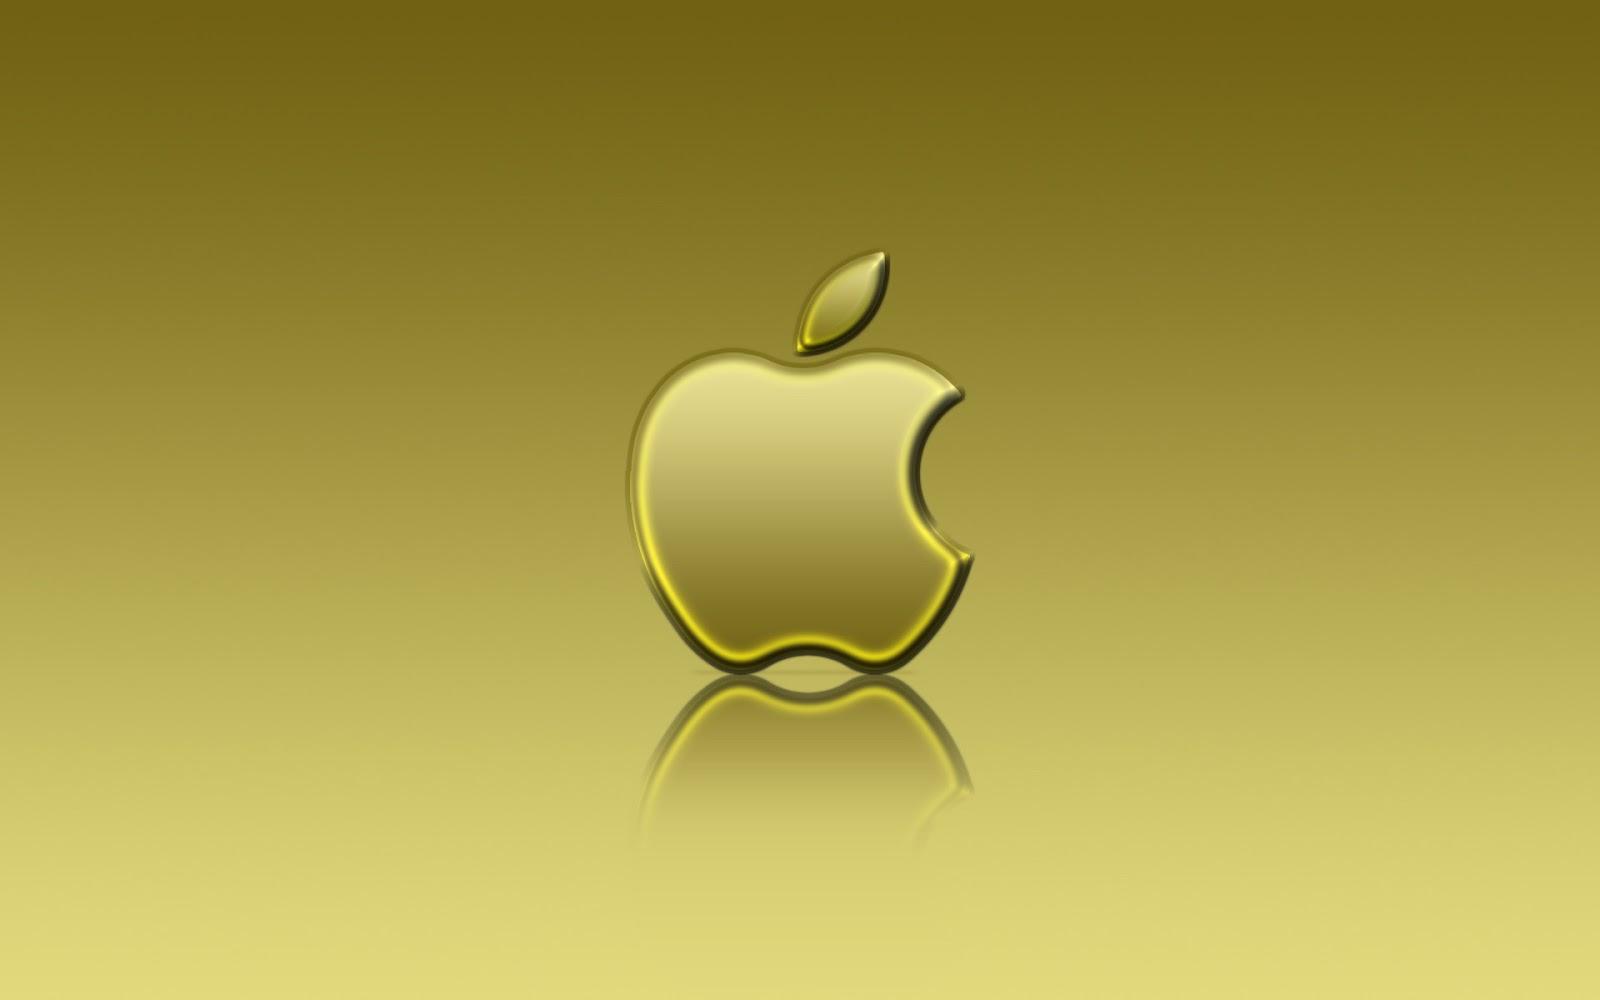 HD yellow wallpaper apple - da men magazine